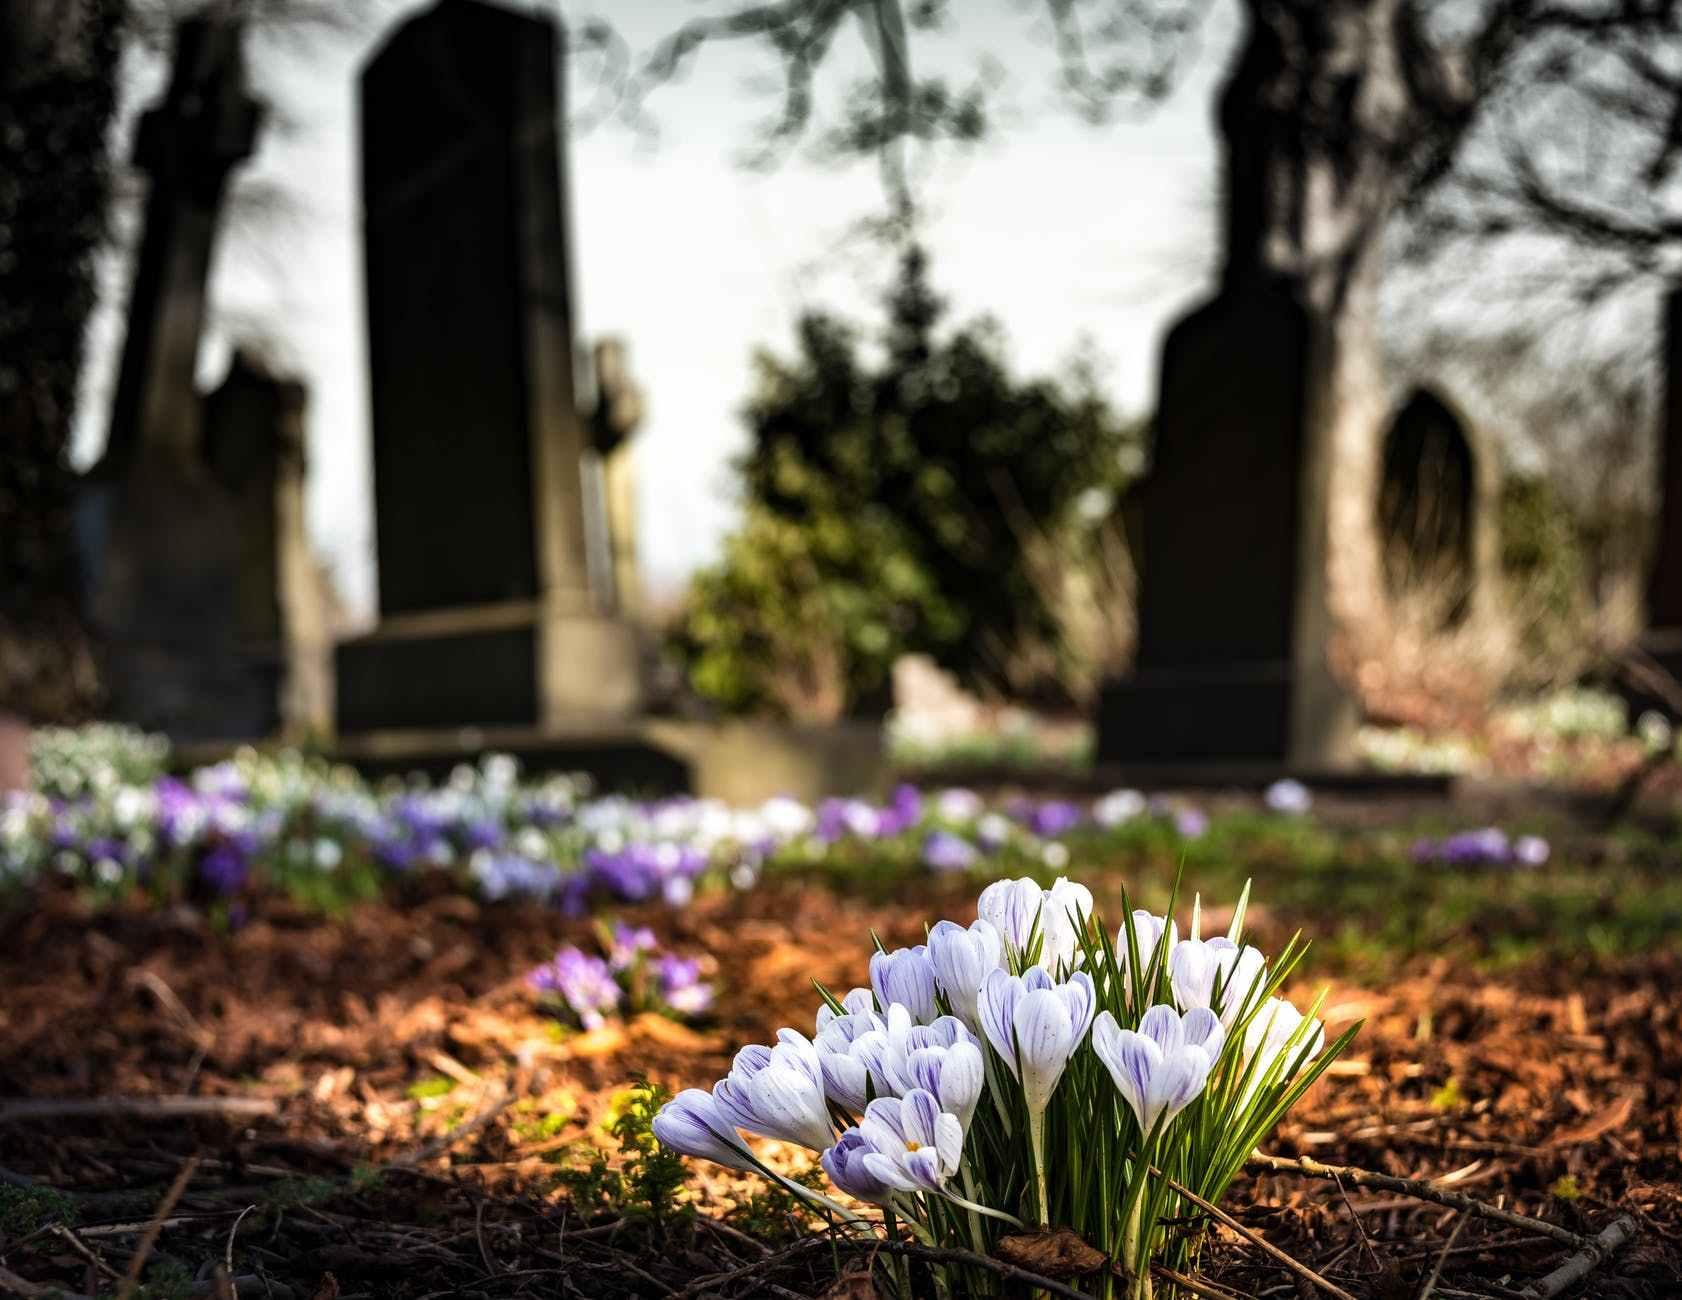 graveyard-church-crocus-cemetery-161280